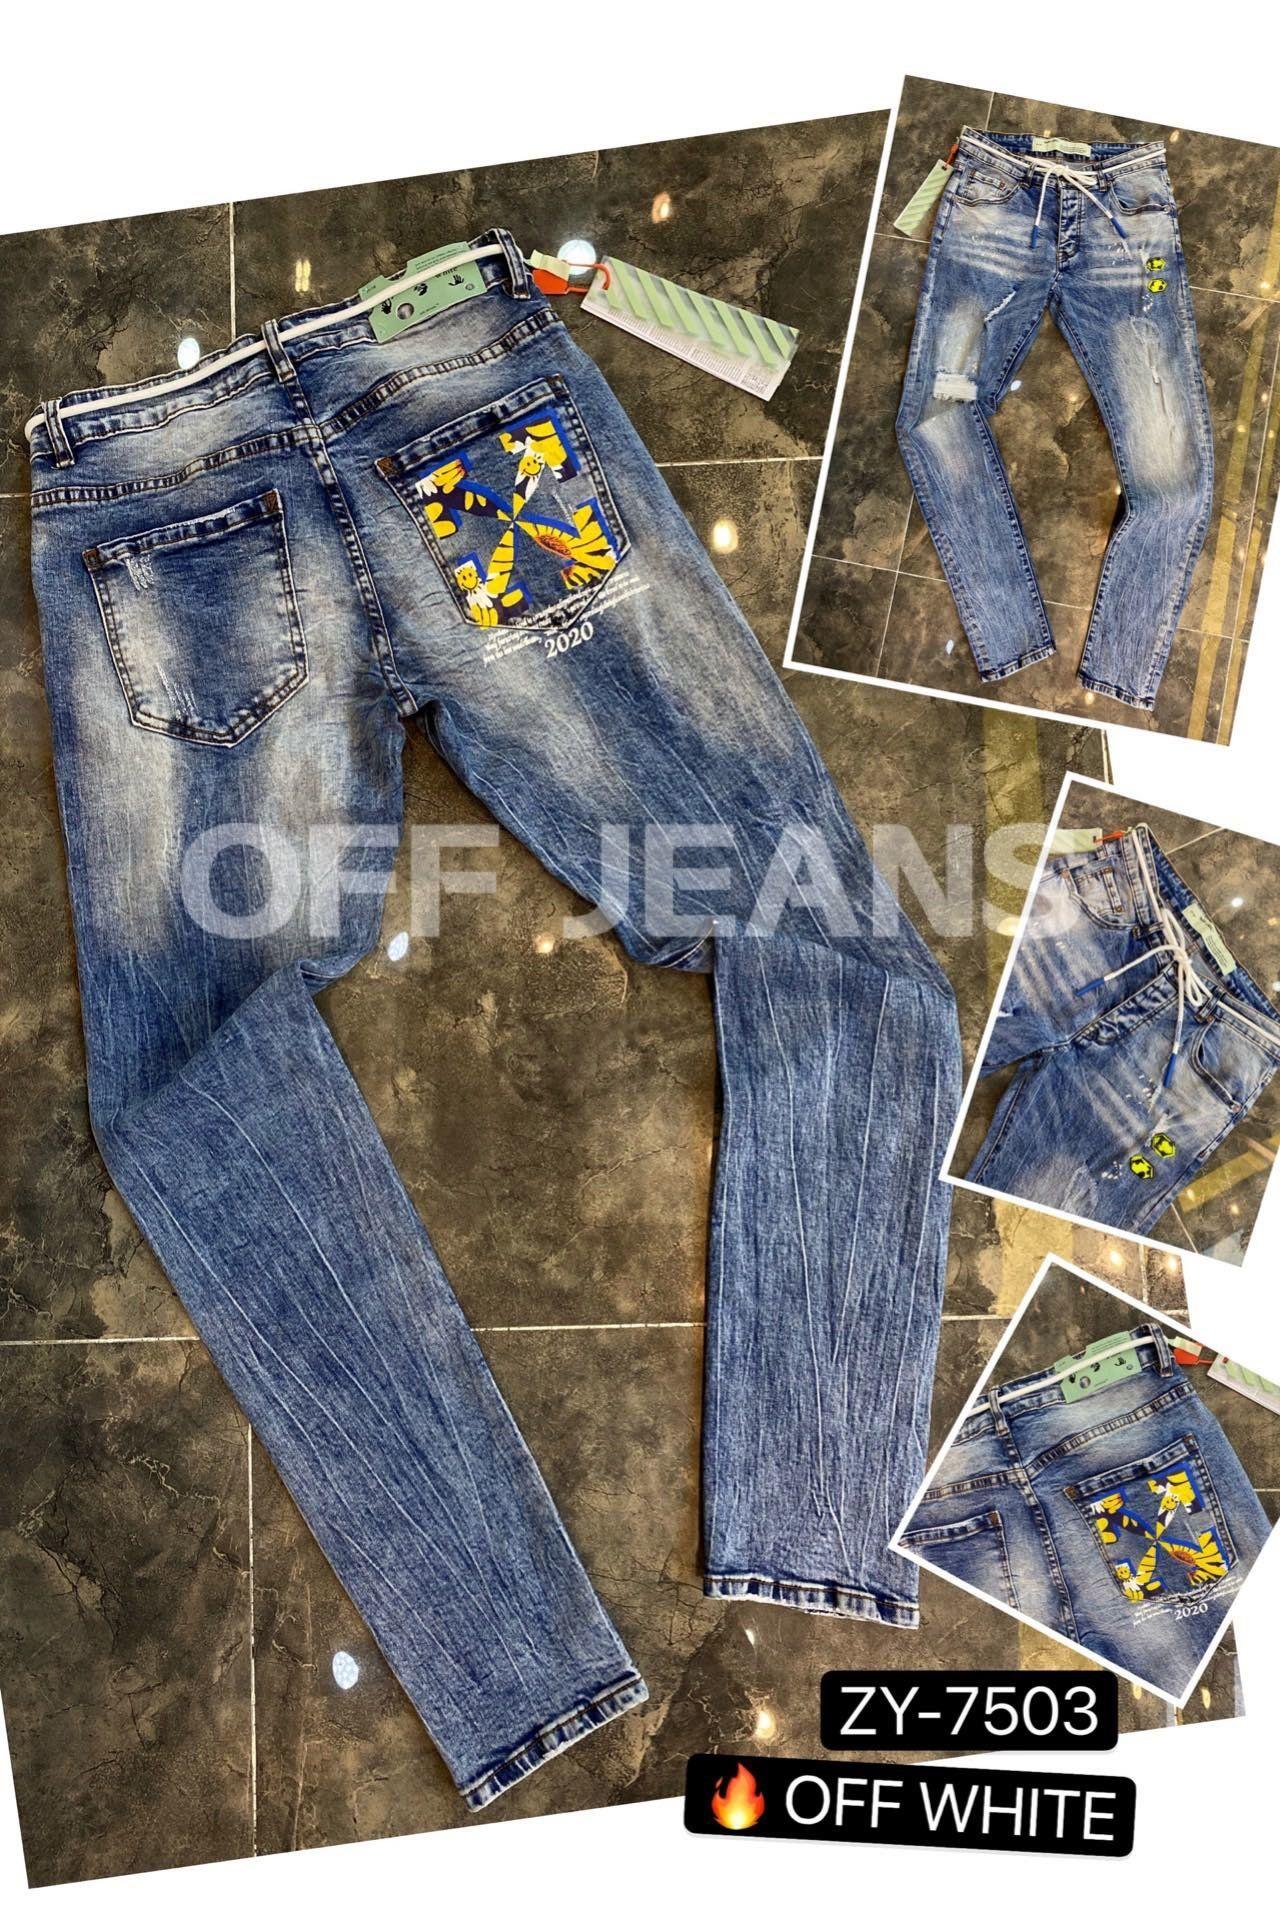 Toptan-Erkek Skinny Düz İnce Elastik Denim Fit Biker Kot Pantolon Ripped Uzun Pantolon Şık Düz Dar Kesim Jeans ~~ SR50 #